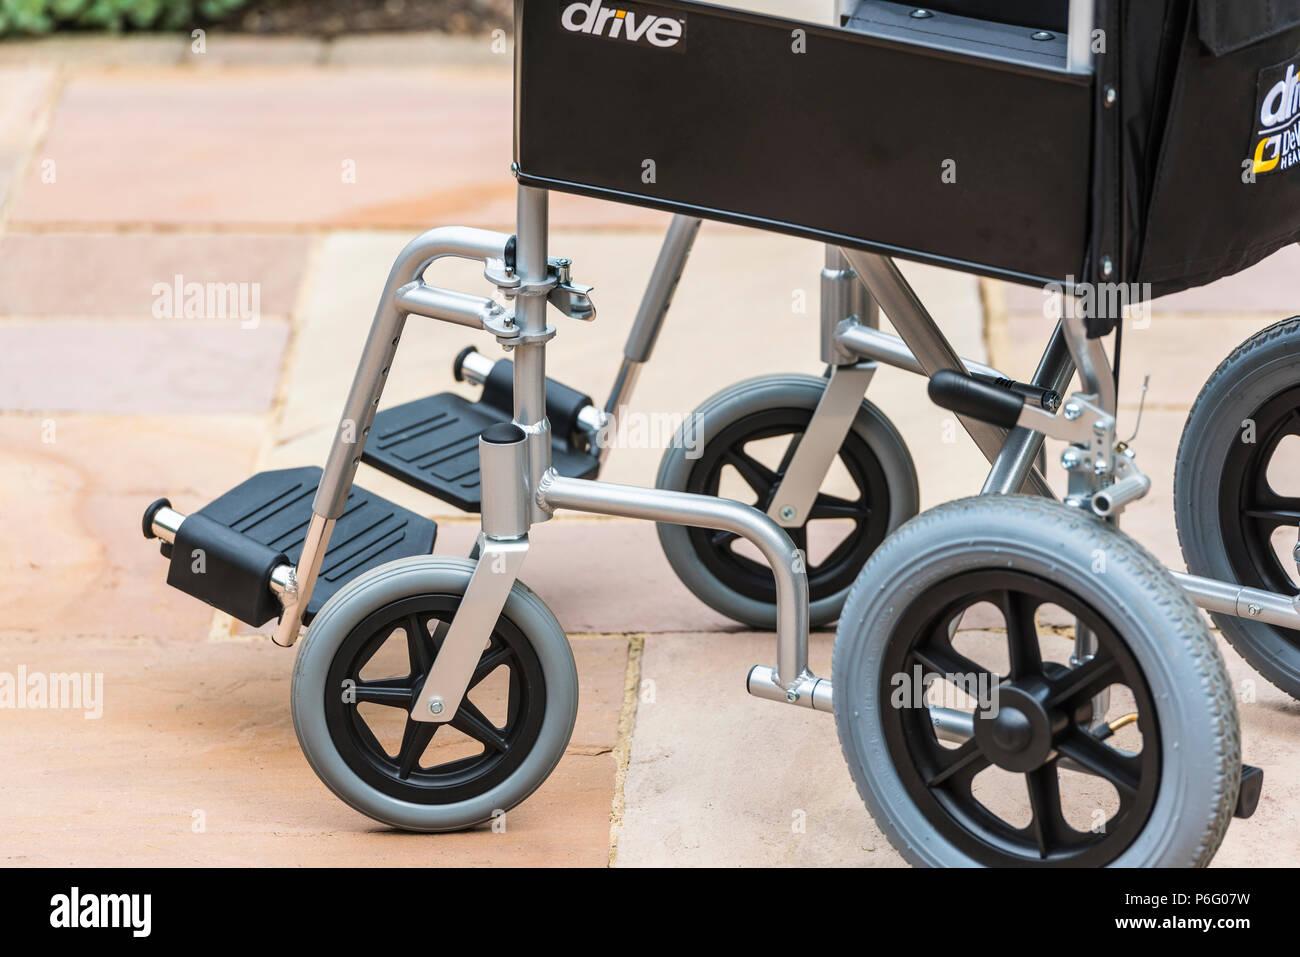 Behinderung, Mobilität, ungültige Rollstuhl. Stockbild